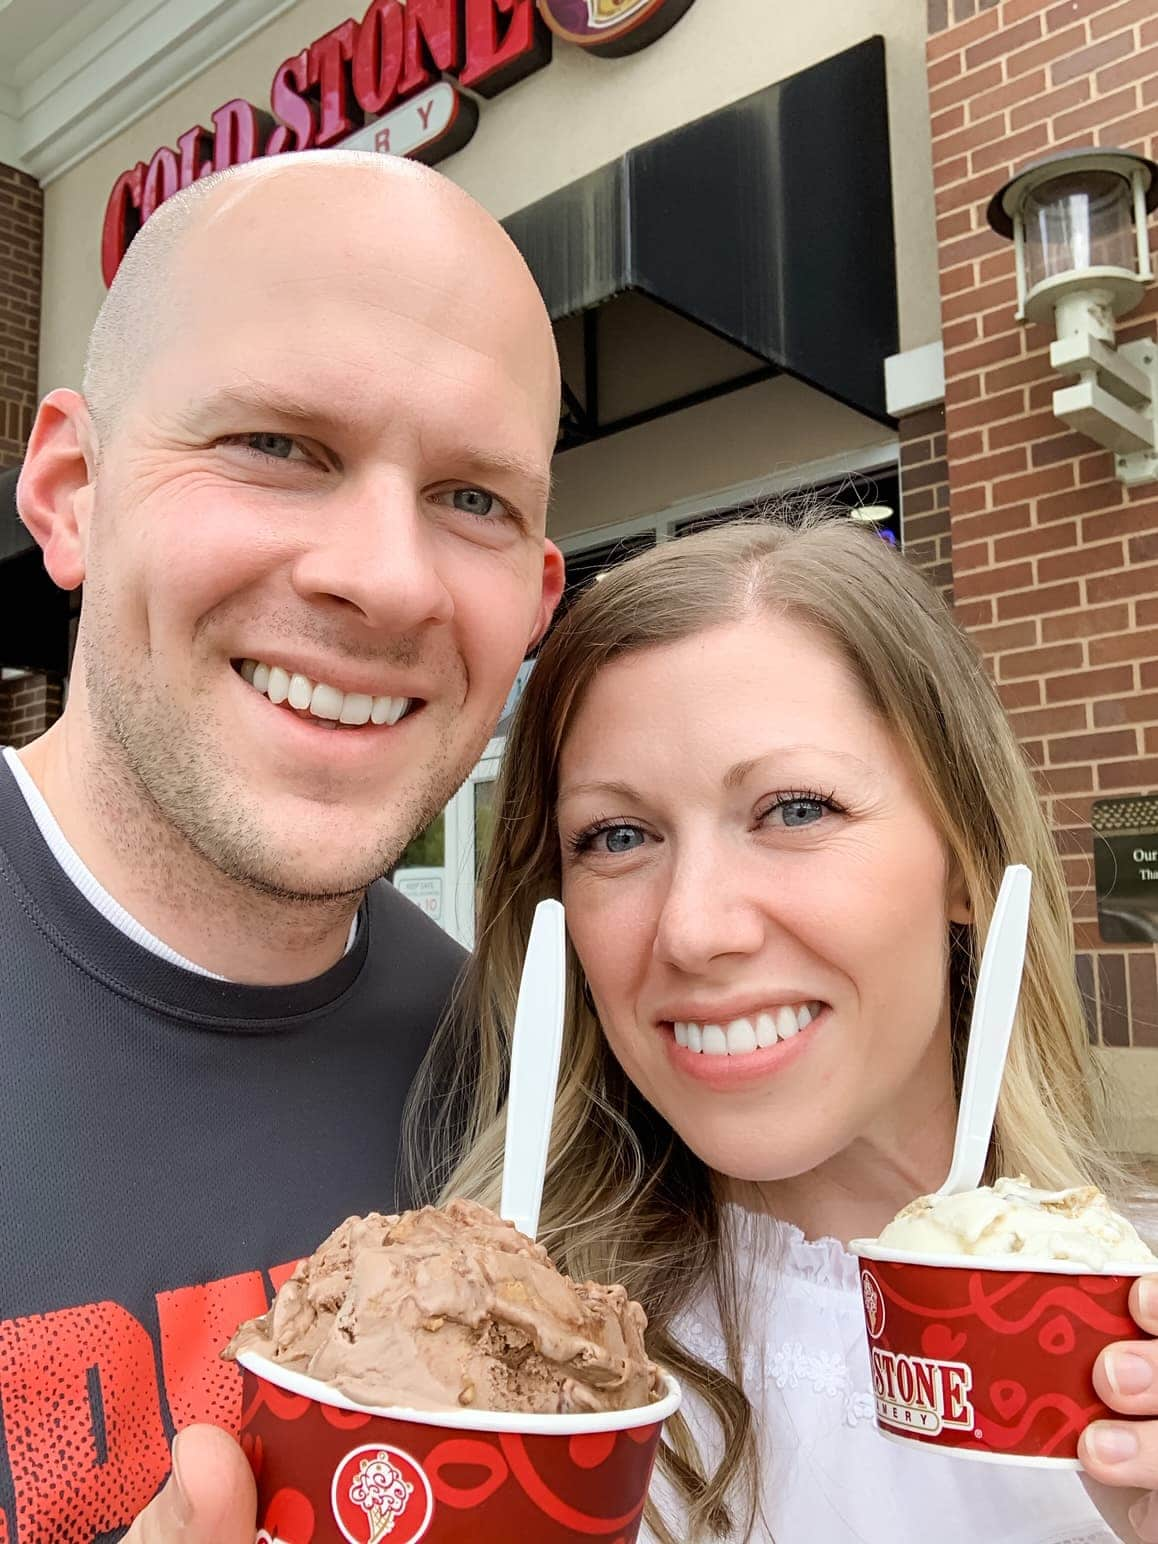 husband and wife holding ice cream